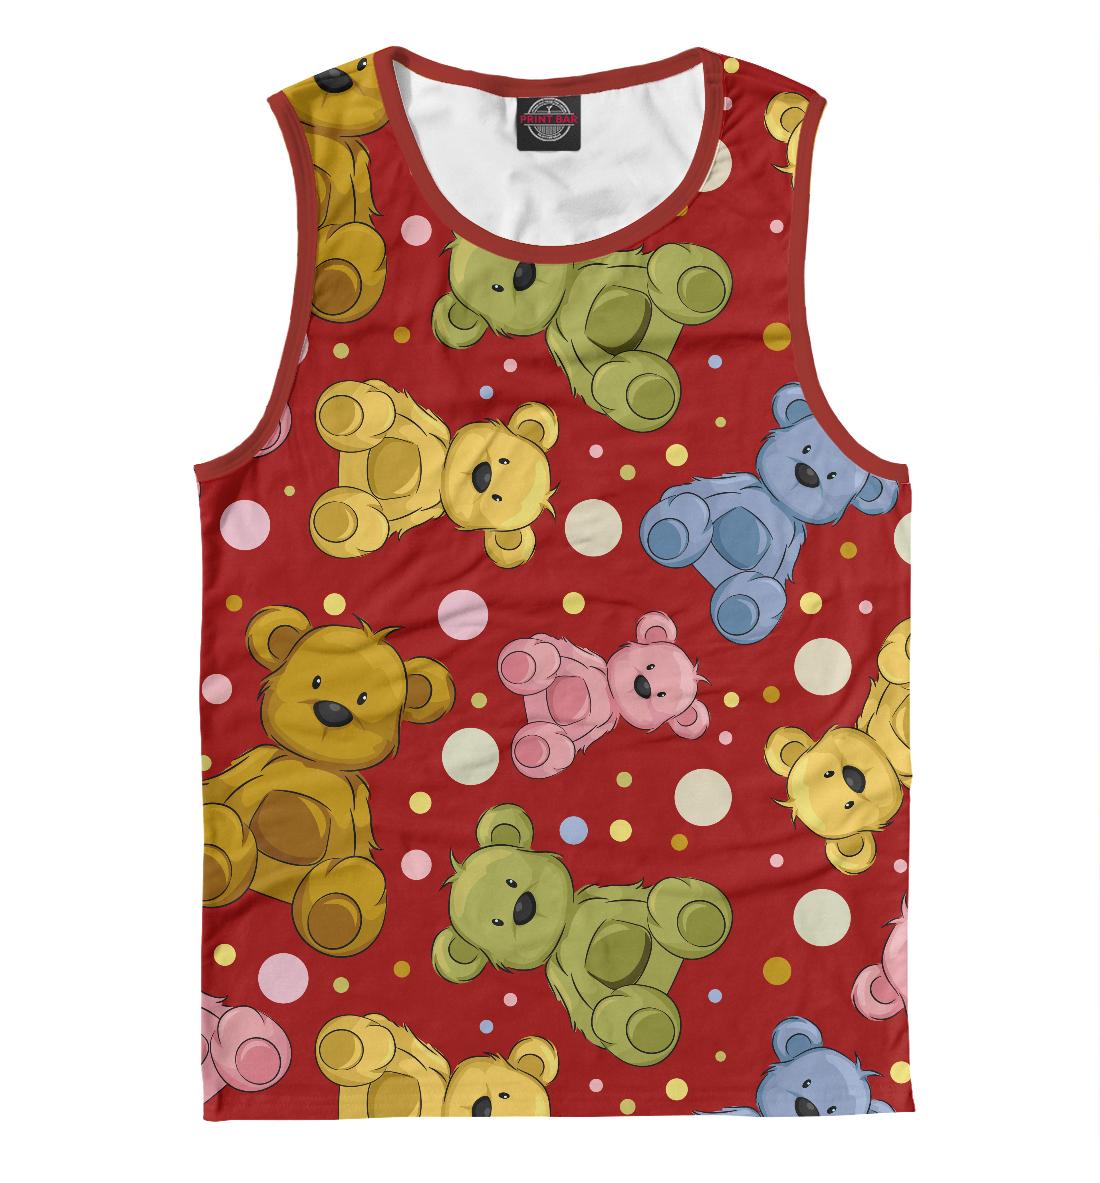 Купить Cute teddy bears, Printbar, Майки, APD-812030-may-2